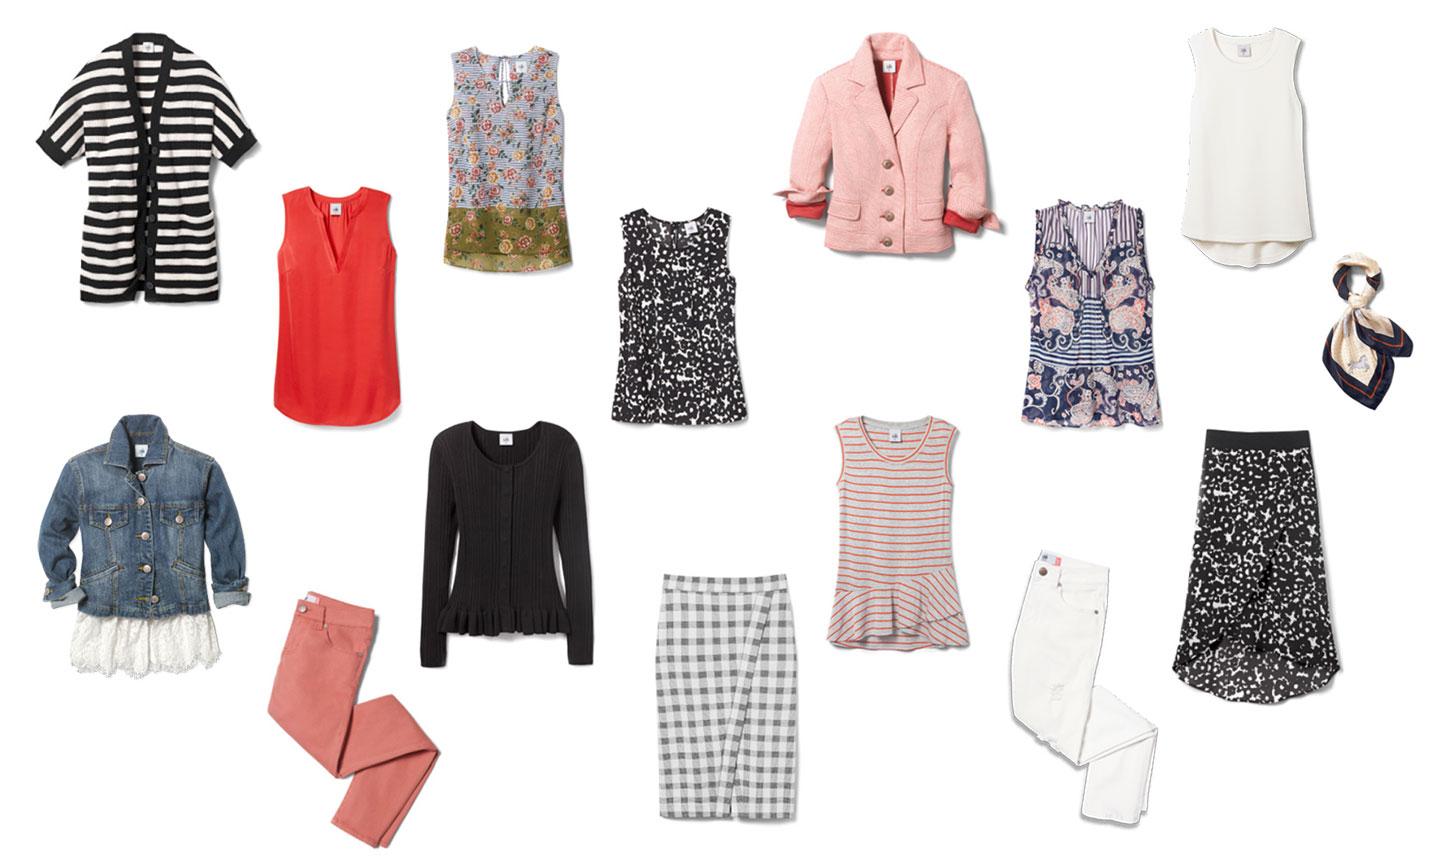 ade9314ffb7 Spring Wardrobe Capsule  15 Items